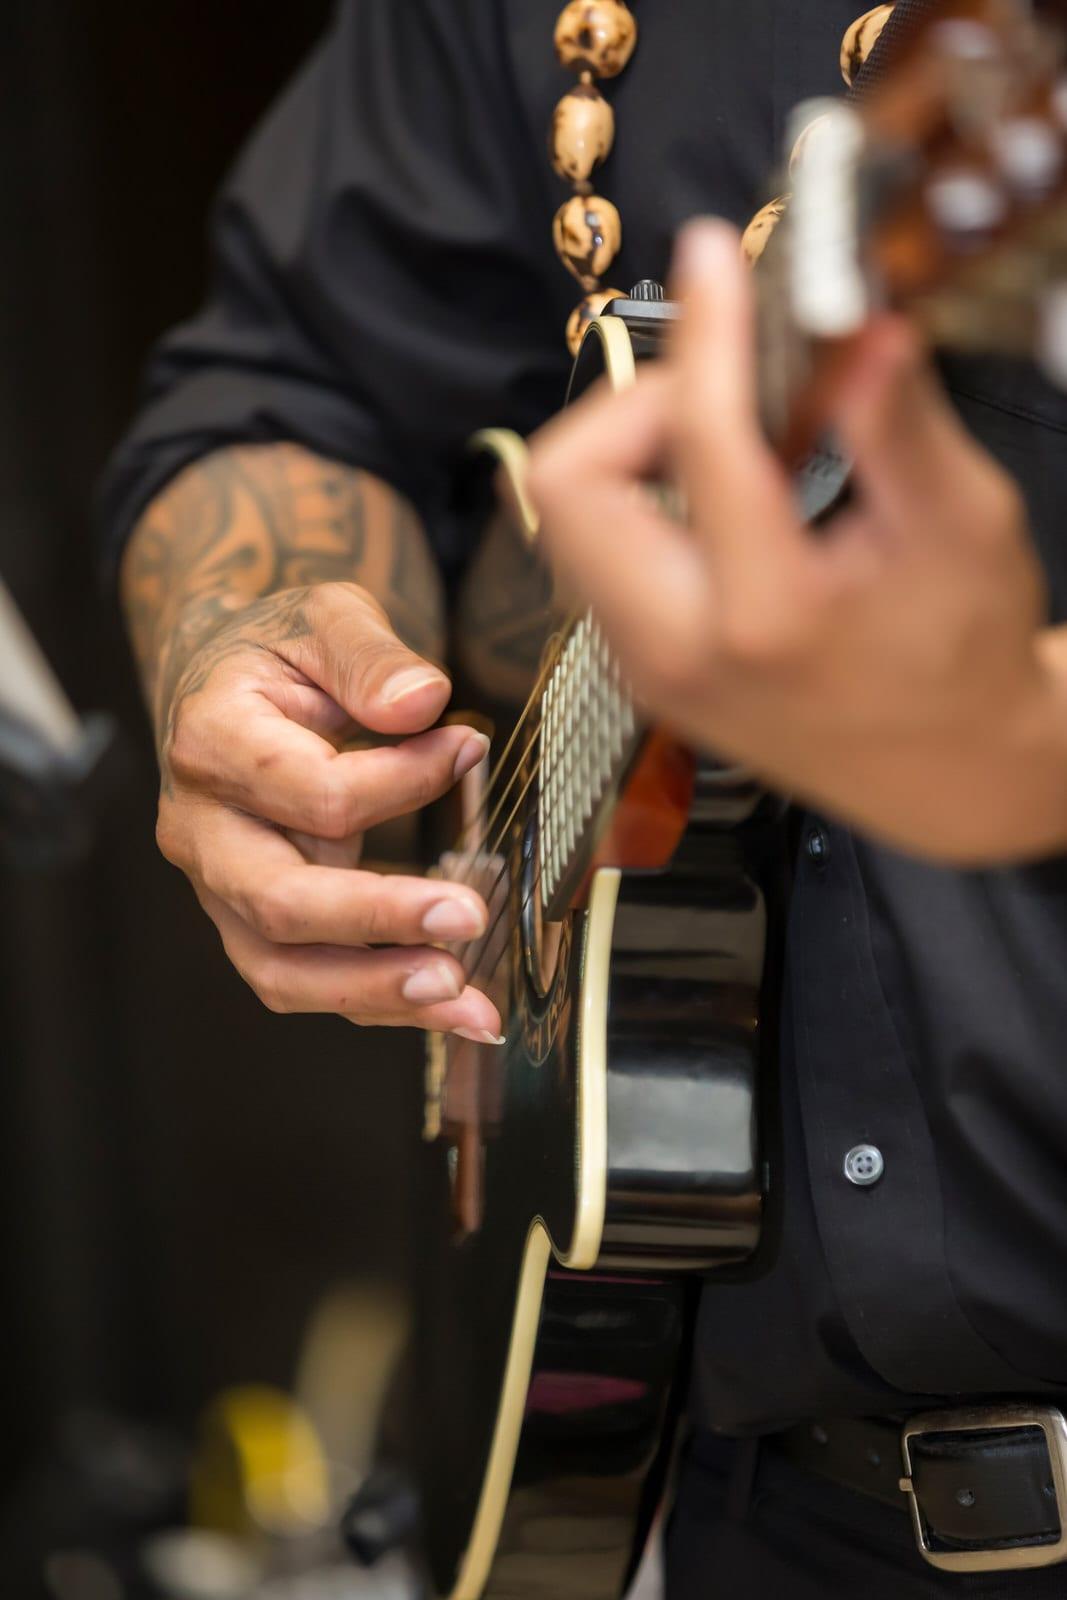 Big-Island-Musician-Band-Photographer-Artist-Portrait-Hawaii-8.jpg